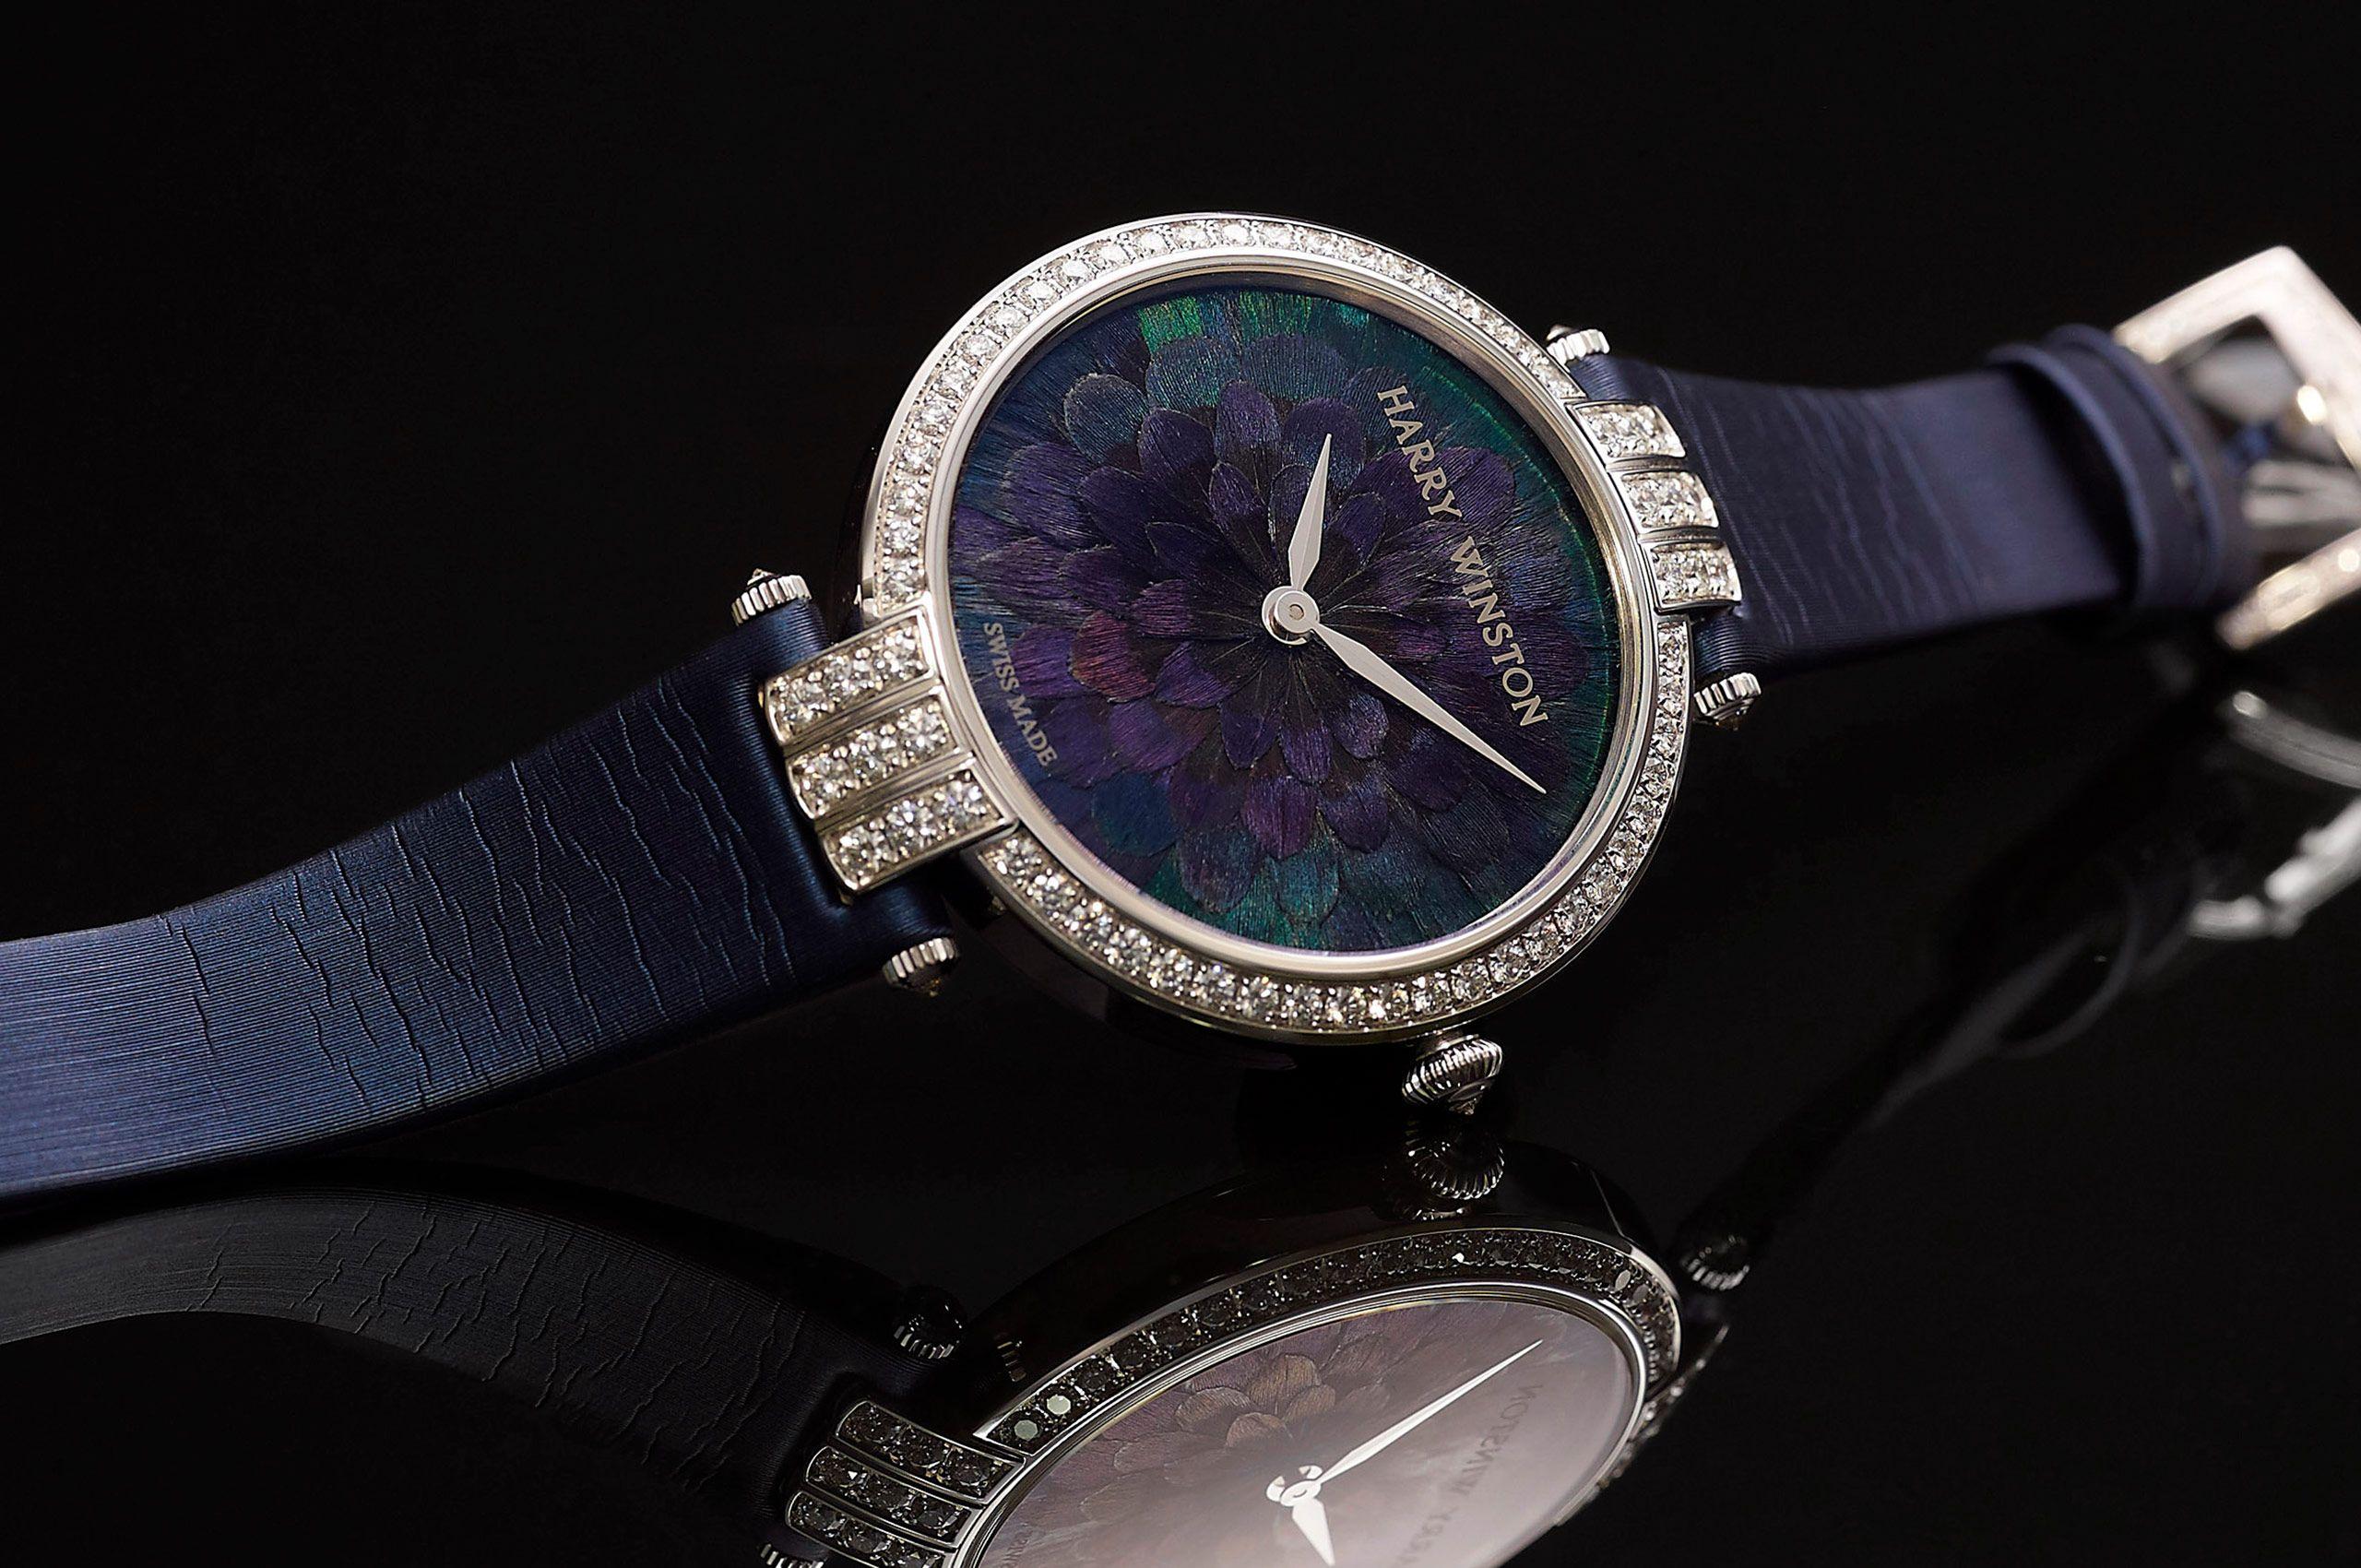 Harry Winston Premier Blue Peacock feather watch